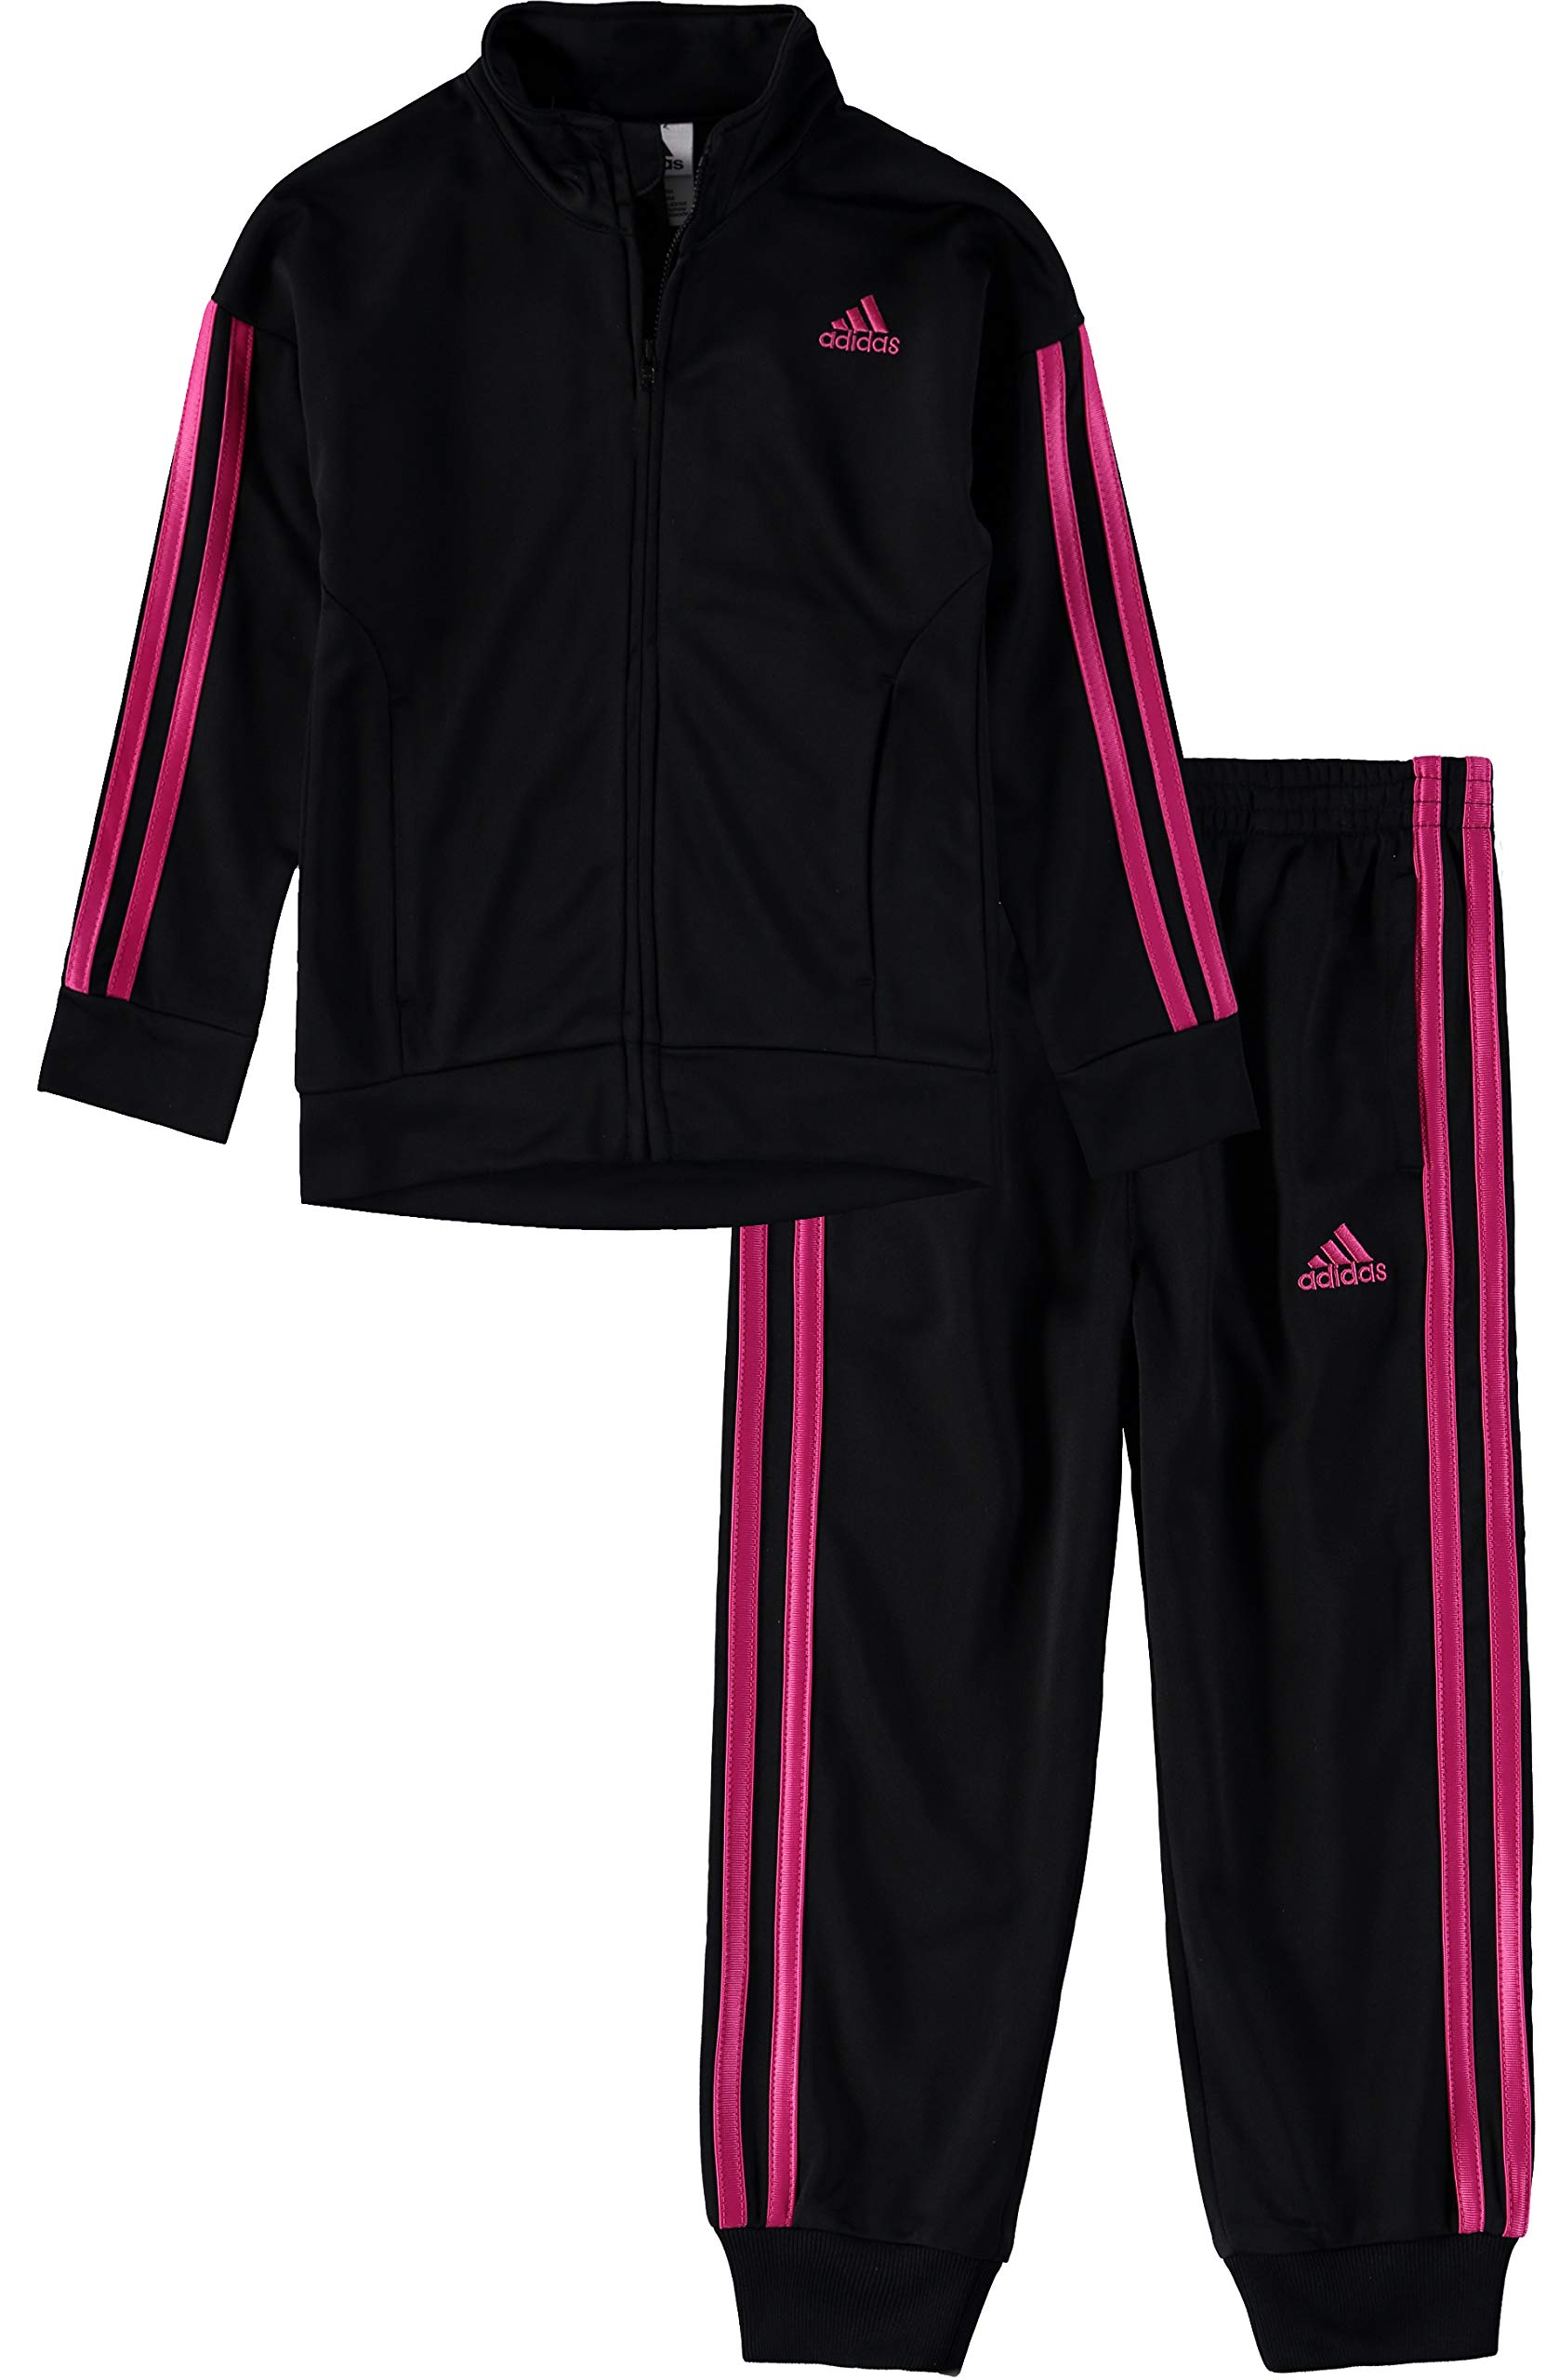 adidas Tricot Jacket Pant Set (Black/Pink, 3T)